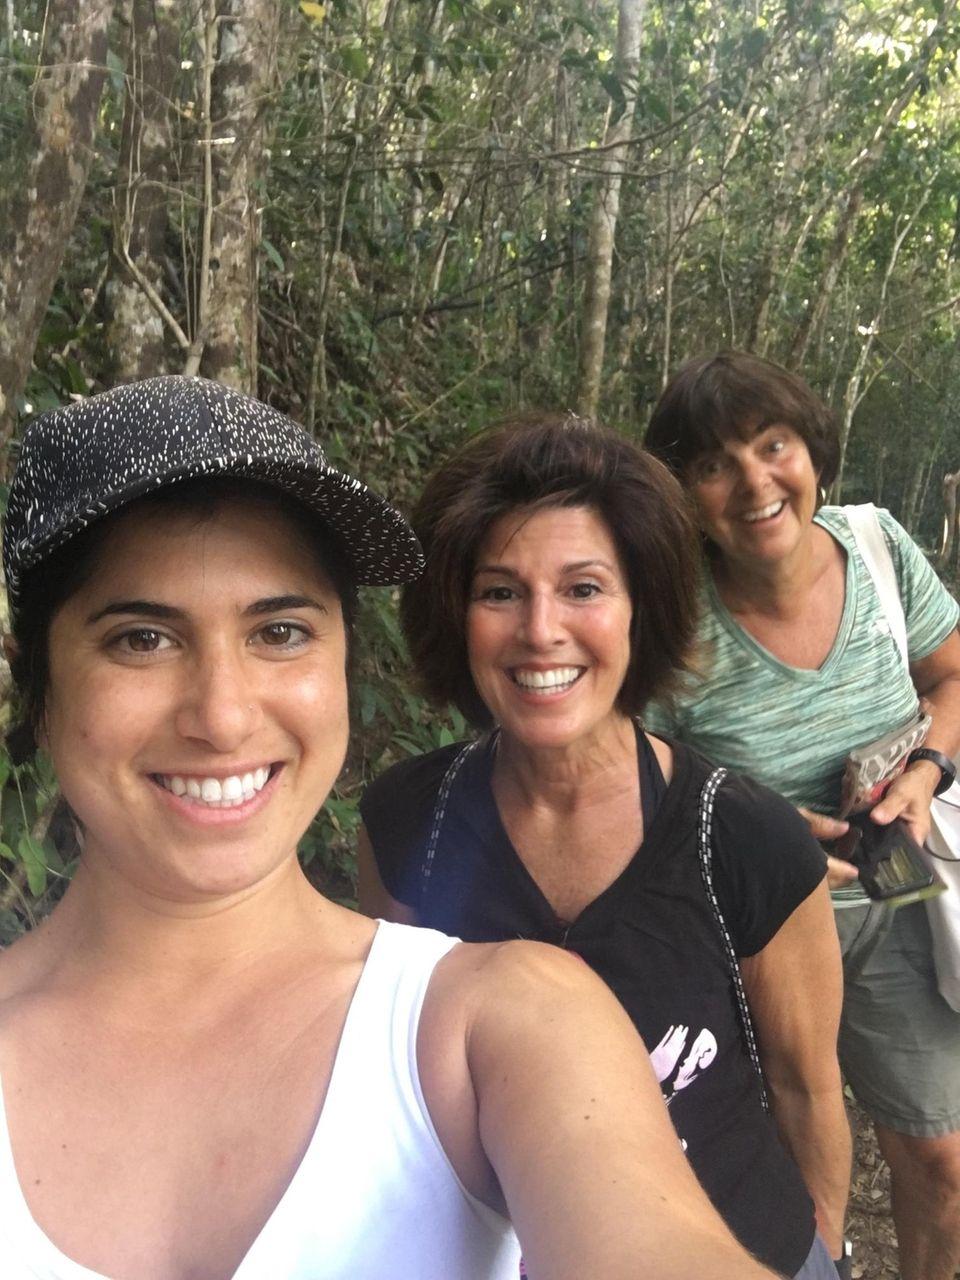 Hiking the trails of St. John, U.S.V.I's National